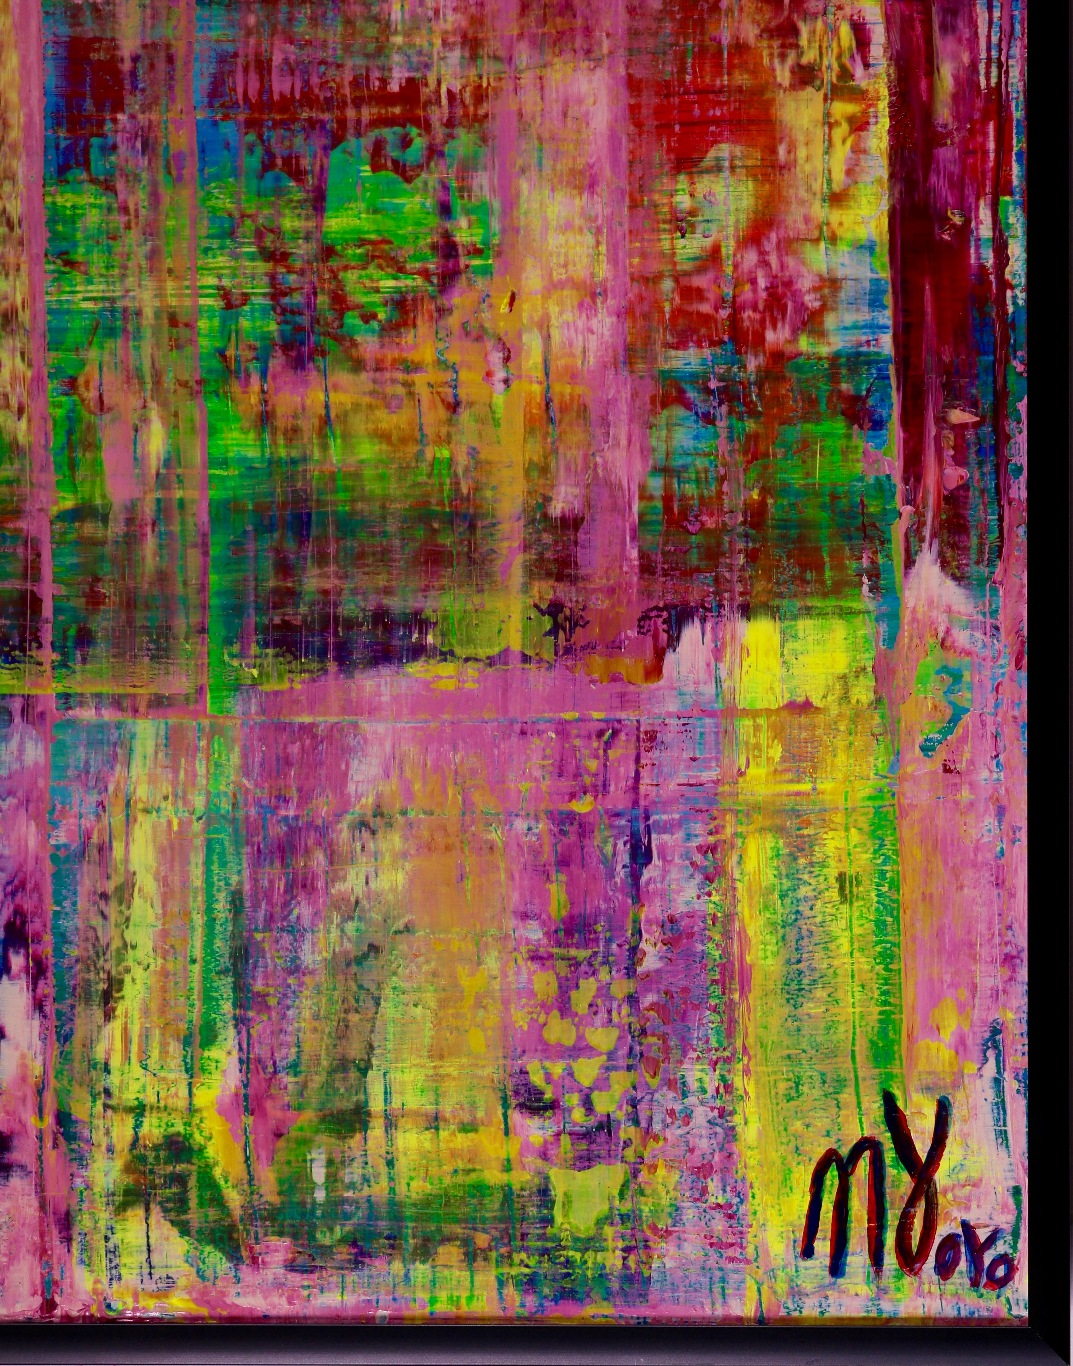 Translucent Migrations by artist Nestor Toro